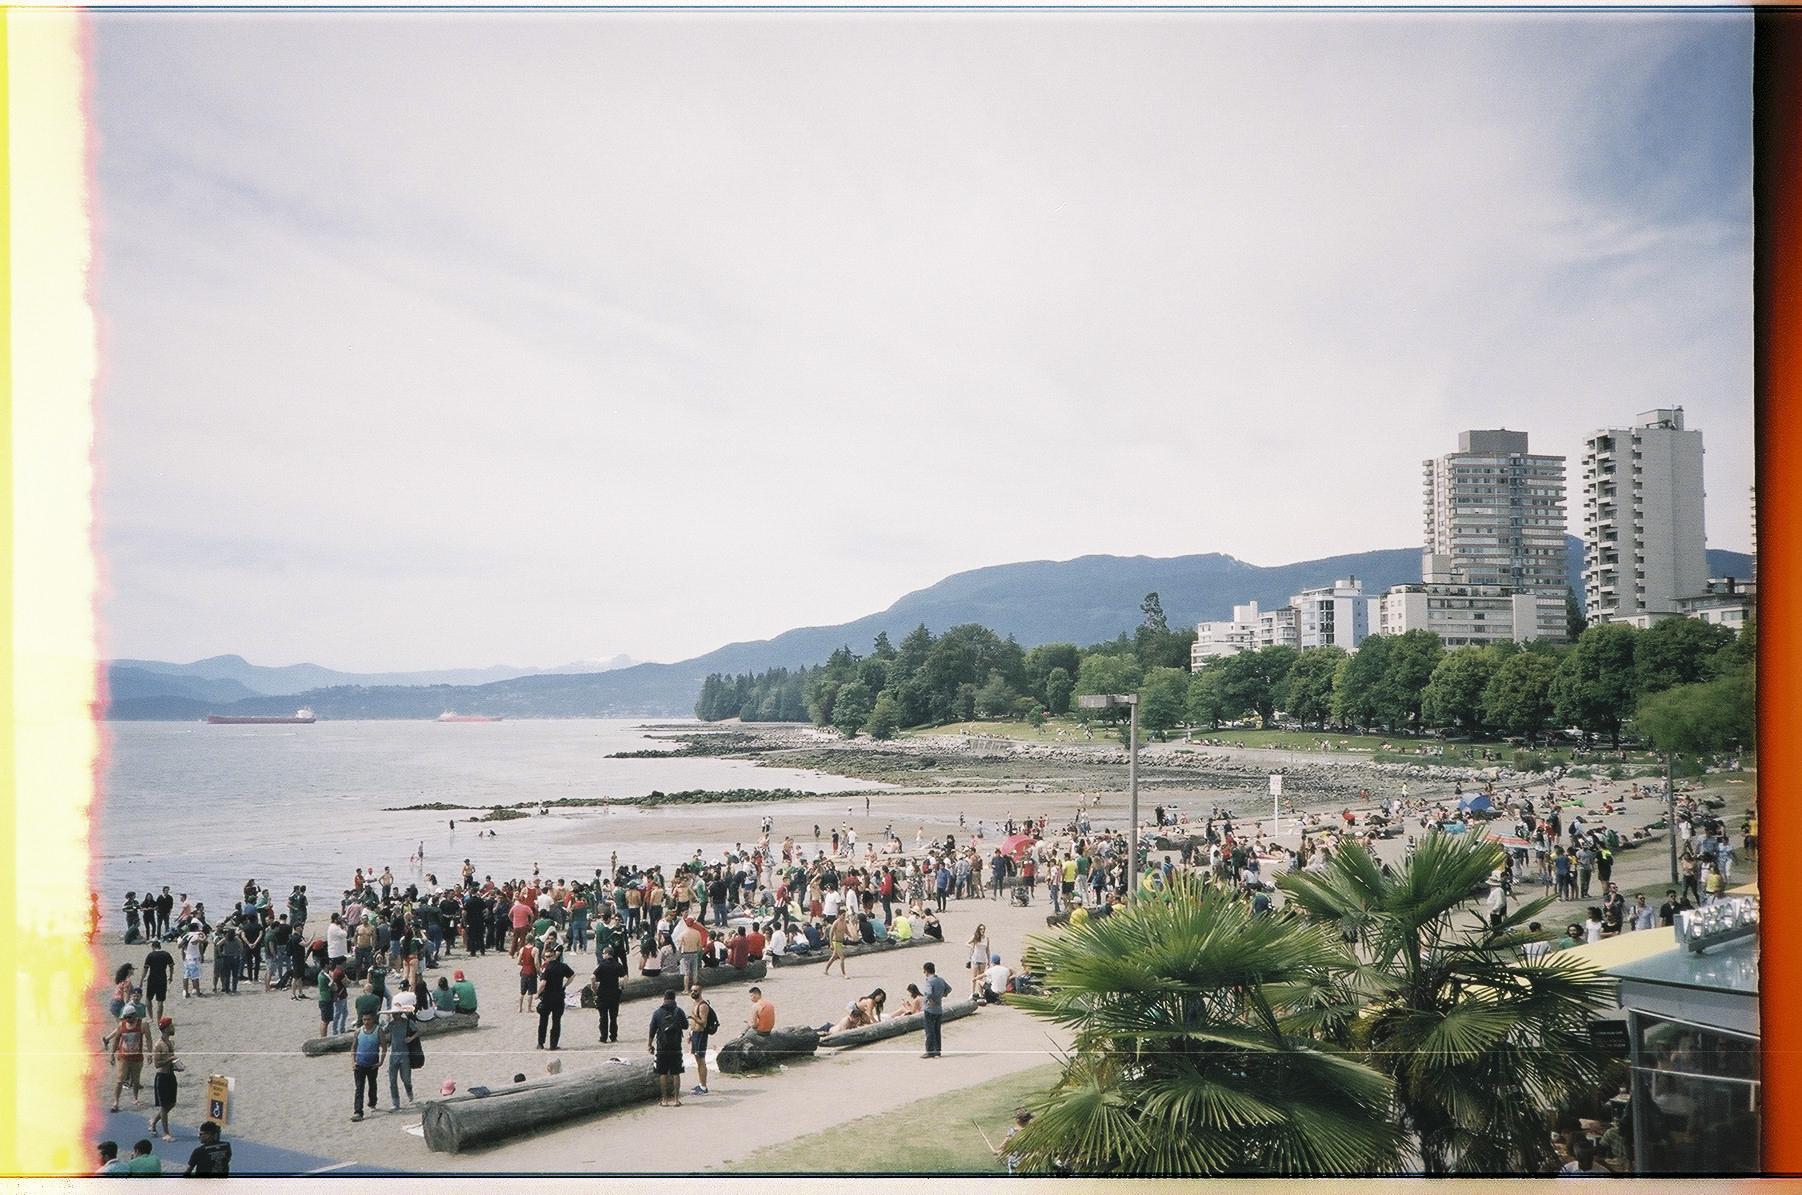 180620_film-6.jpg